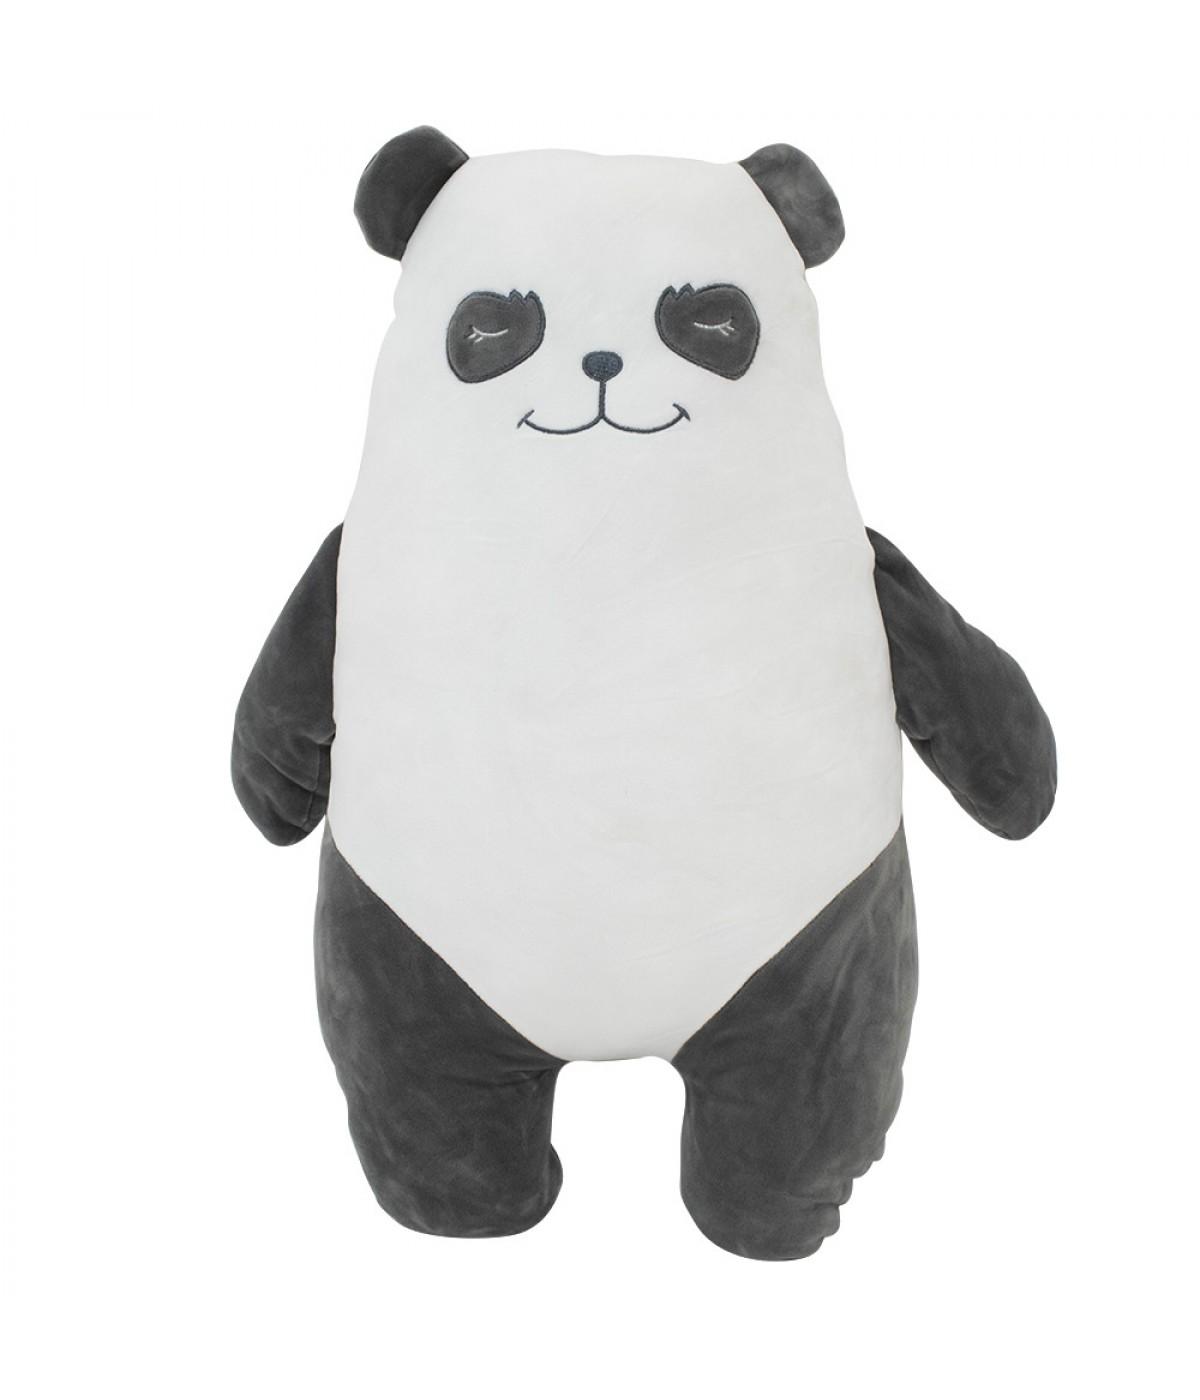 Almofada Formato Urso Panda Pelúcia 53cm